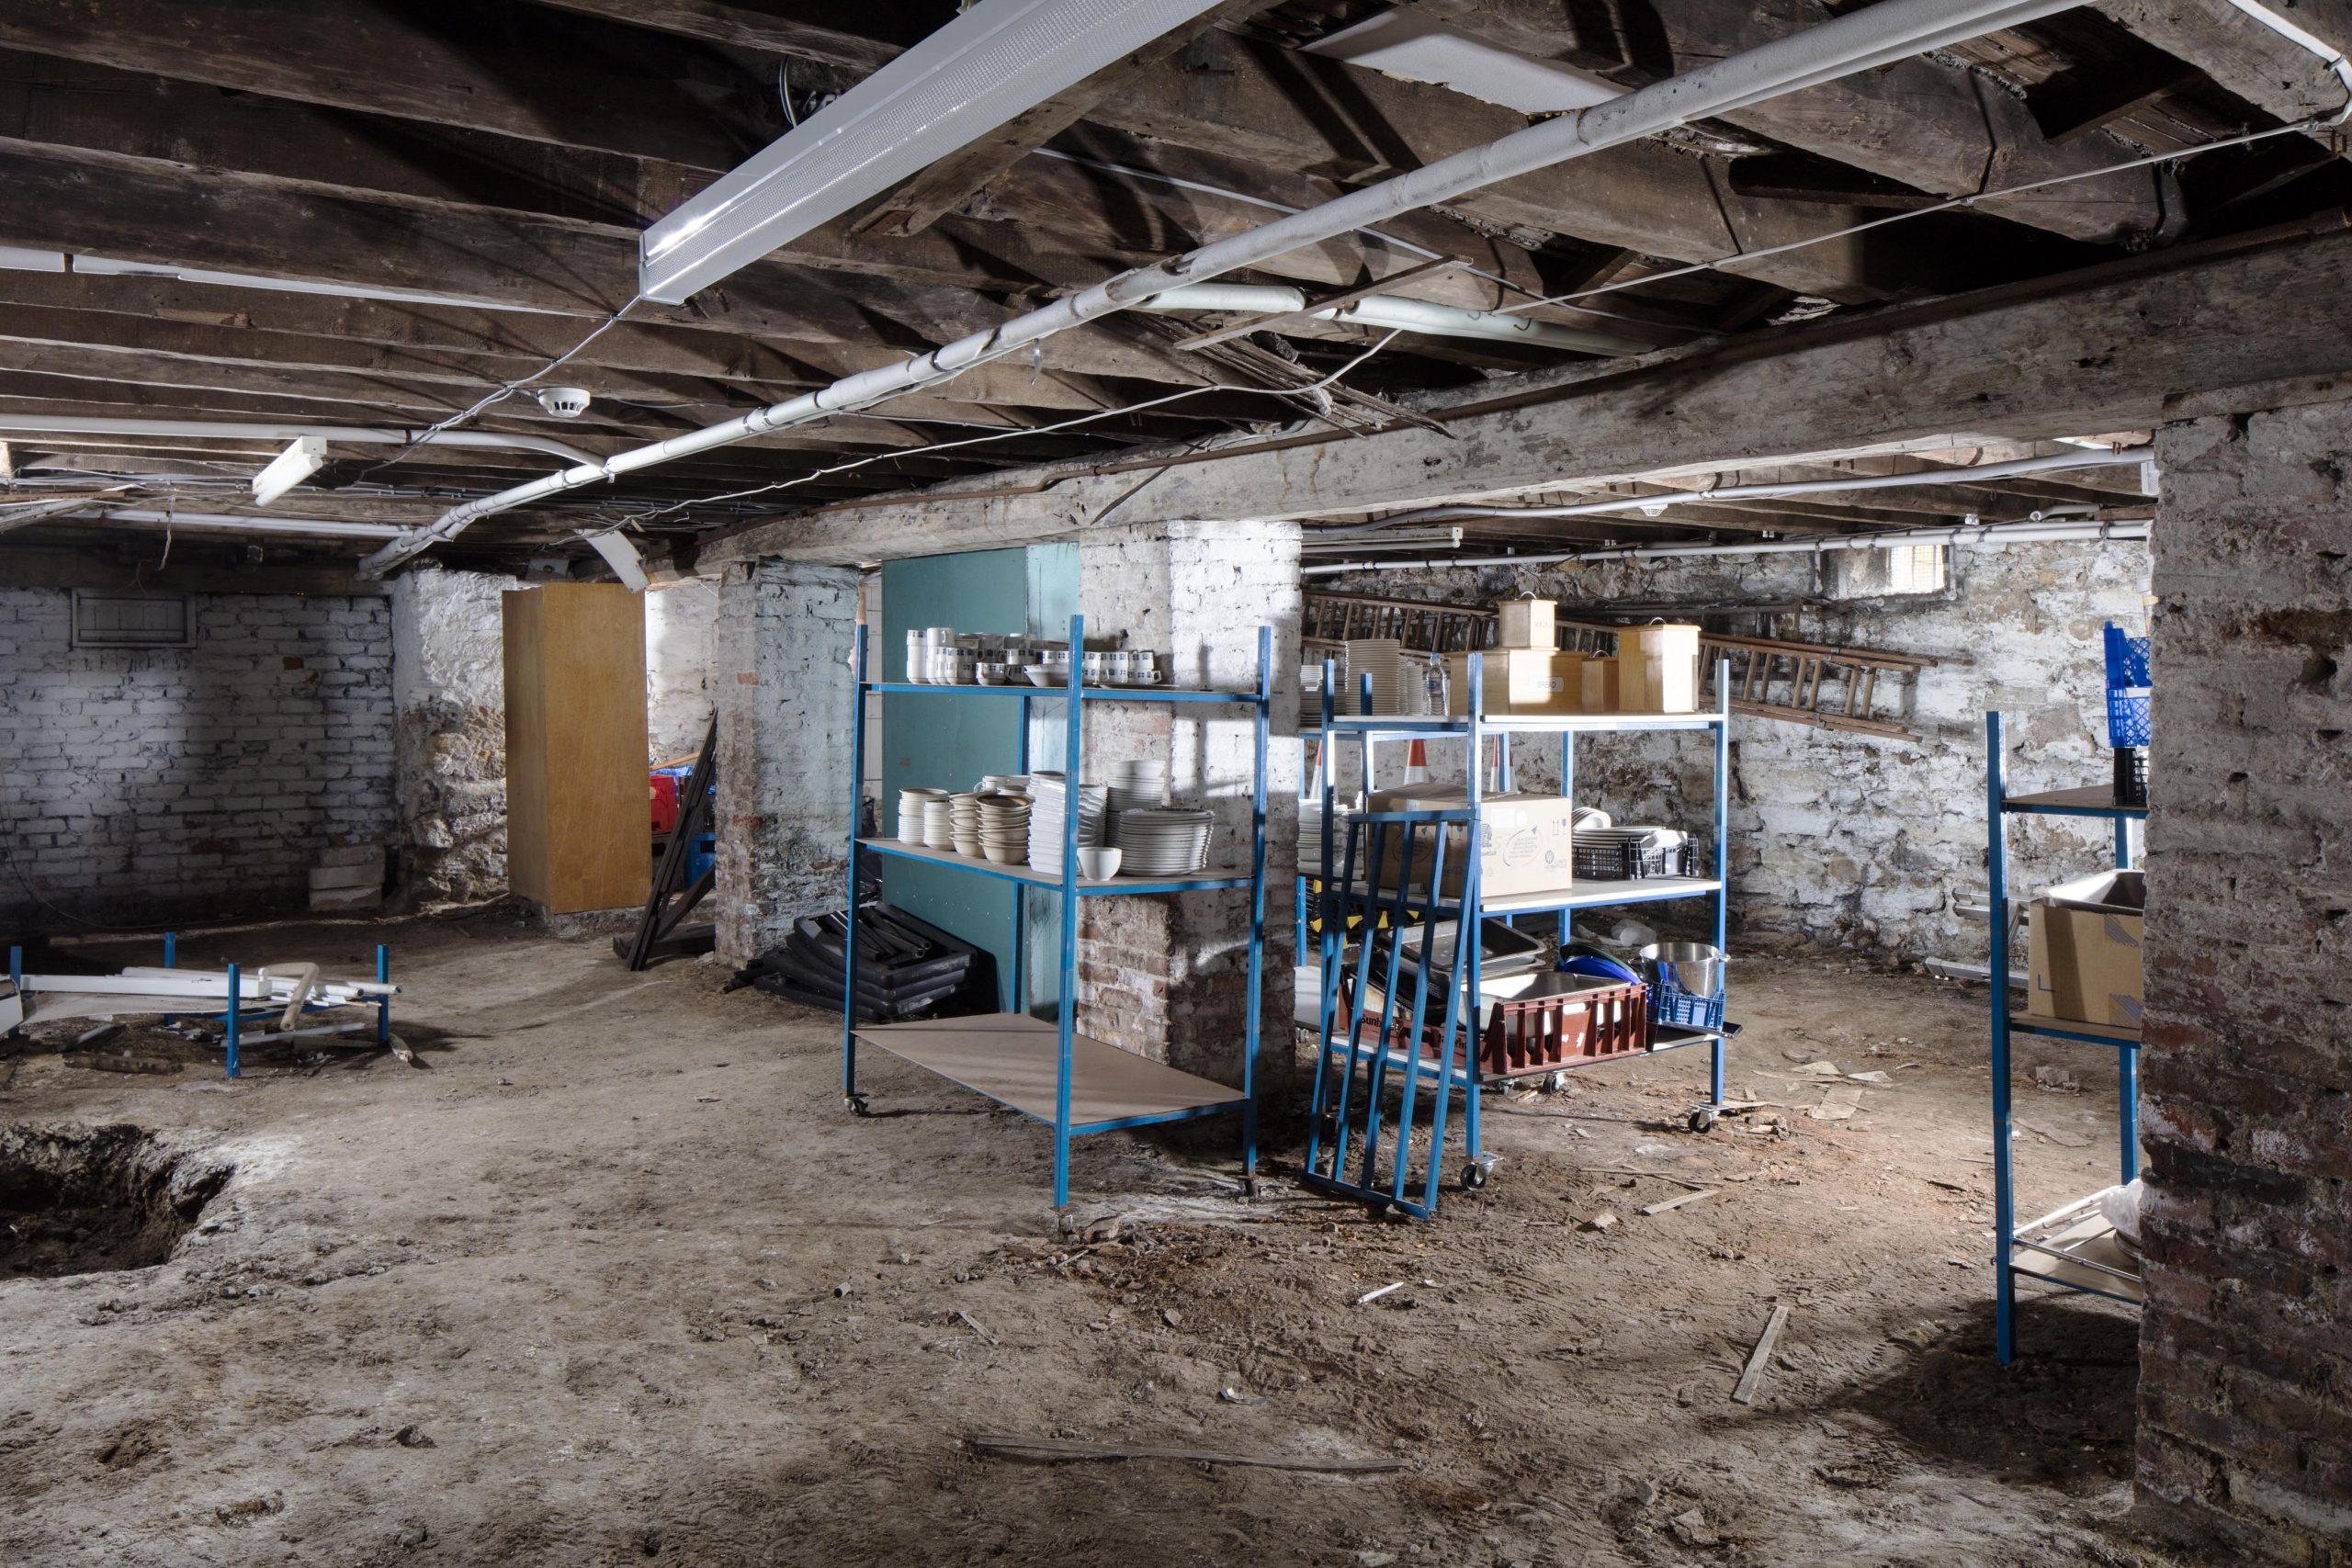 Queen Street Masonic Temple Cellar